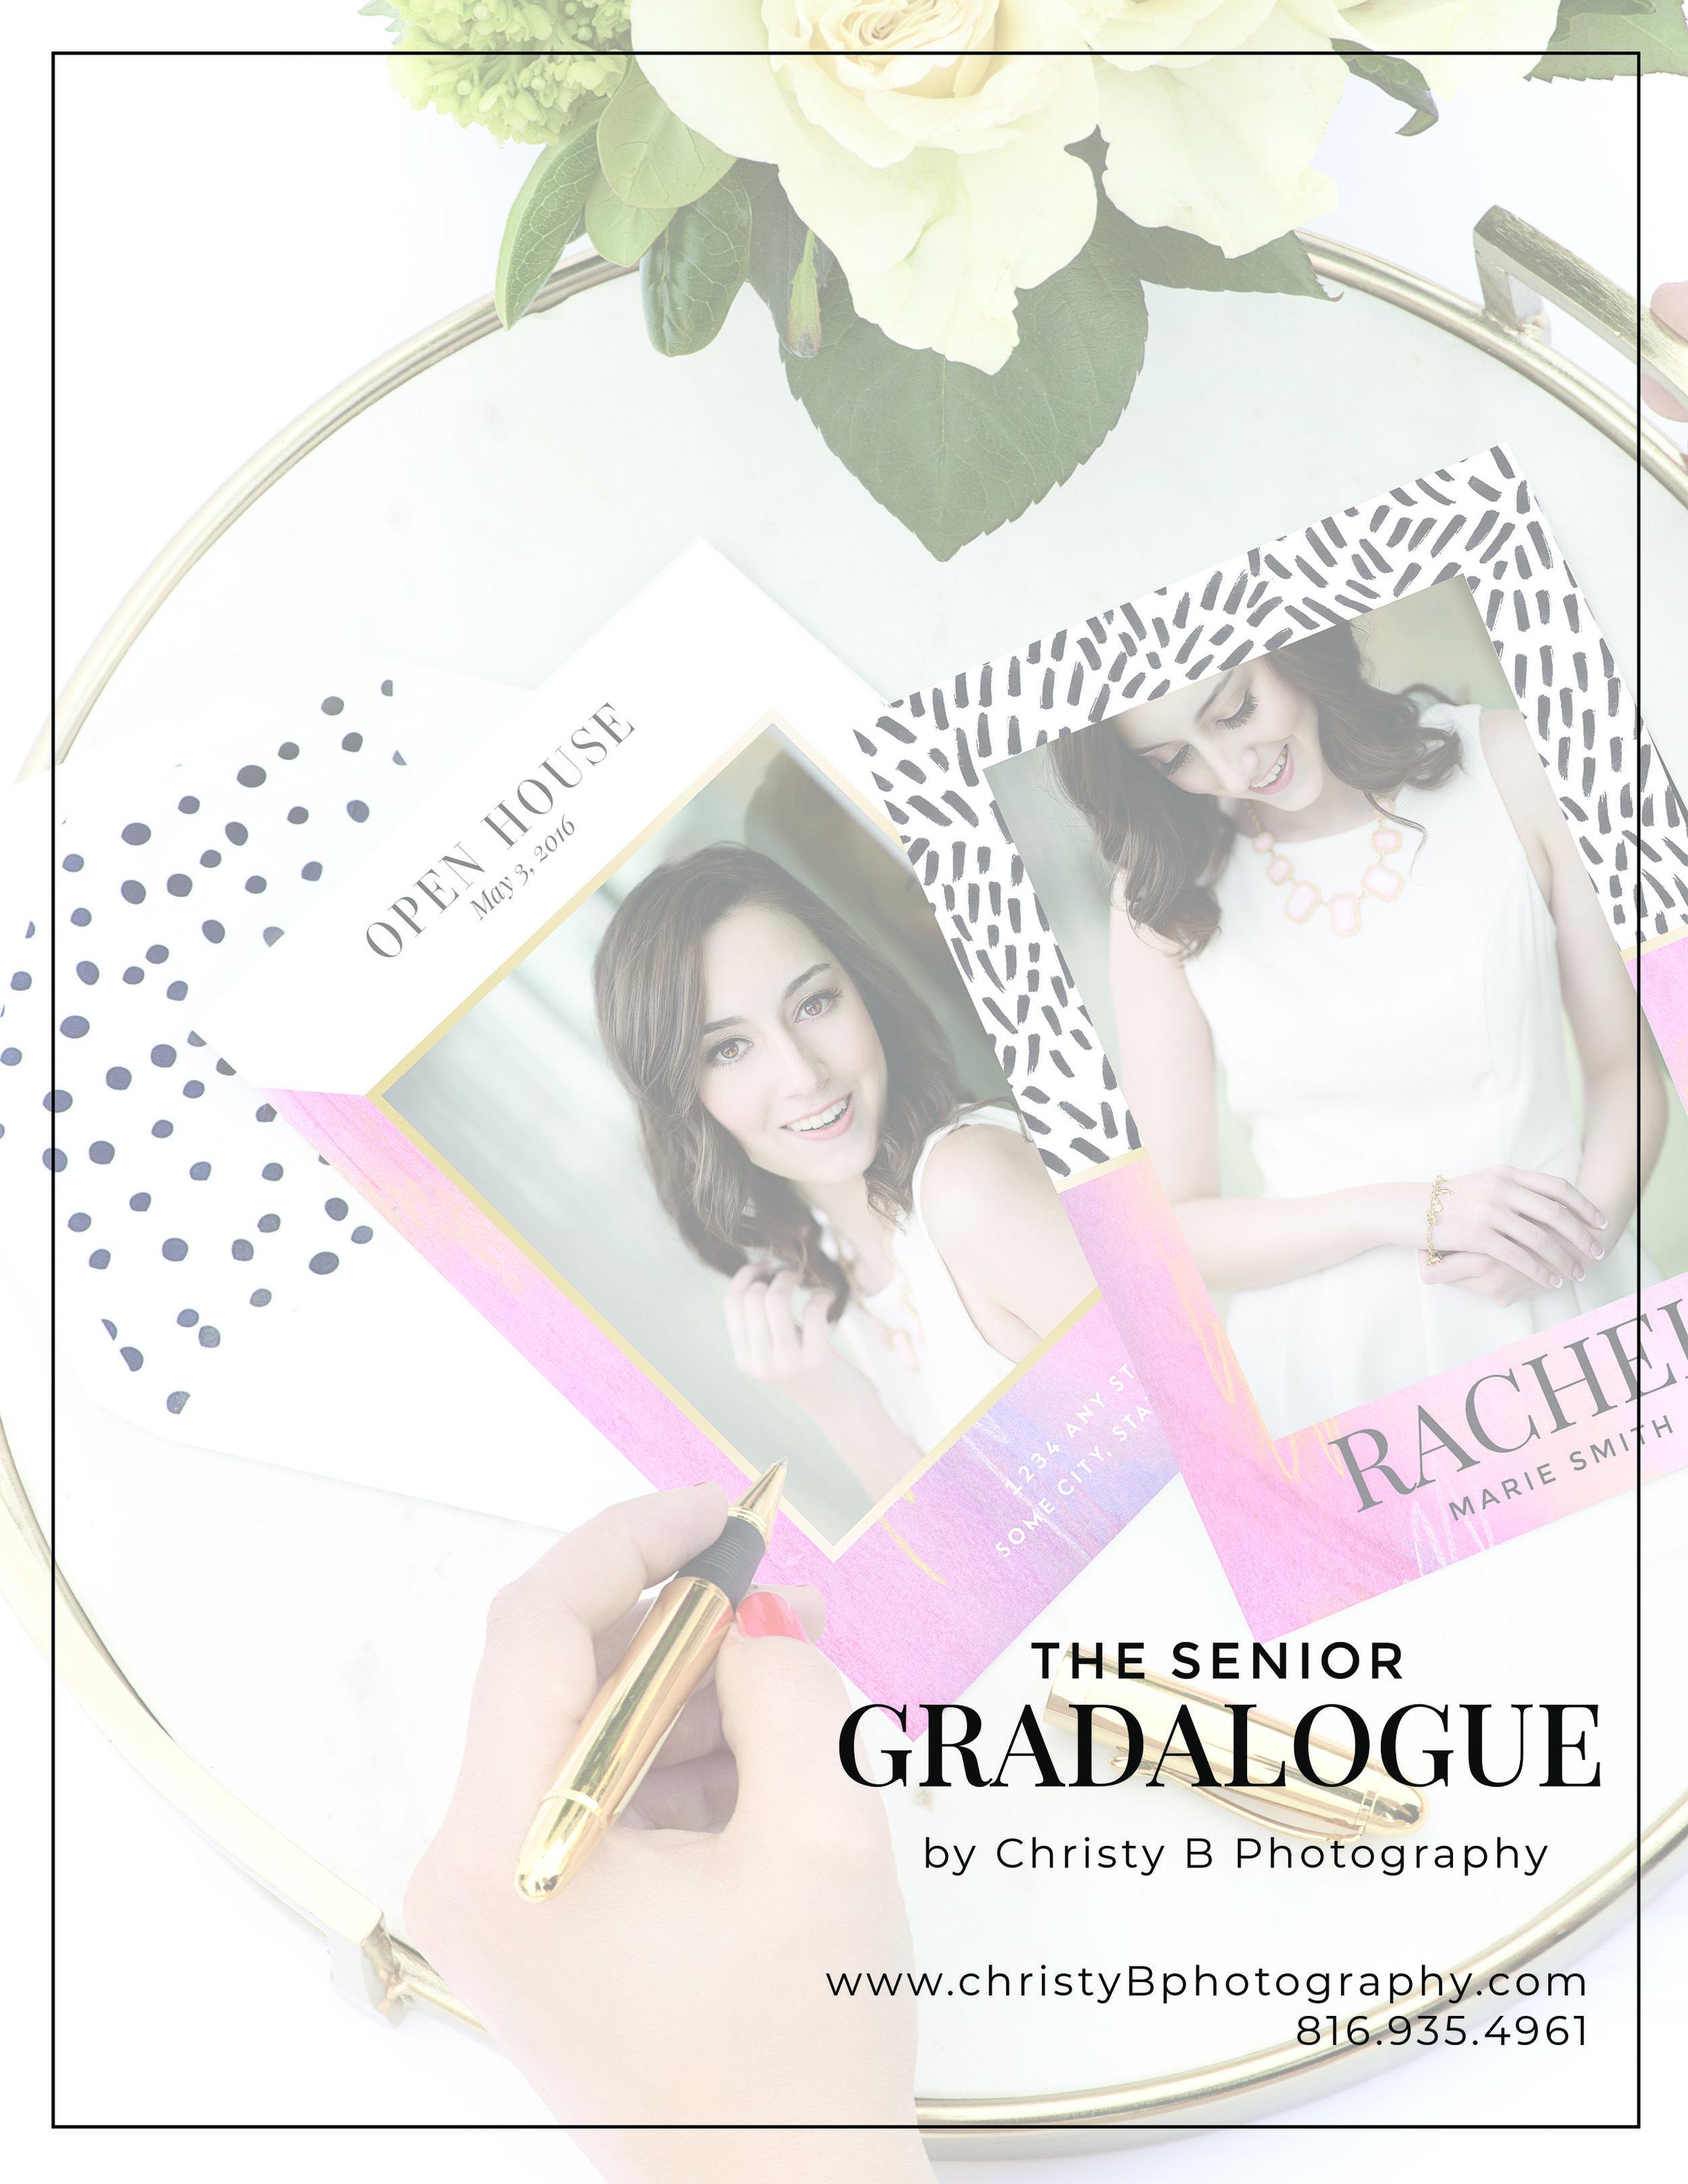 010 - Gradalogue-Back-Cover.jpg